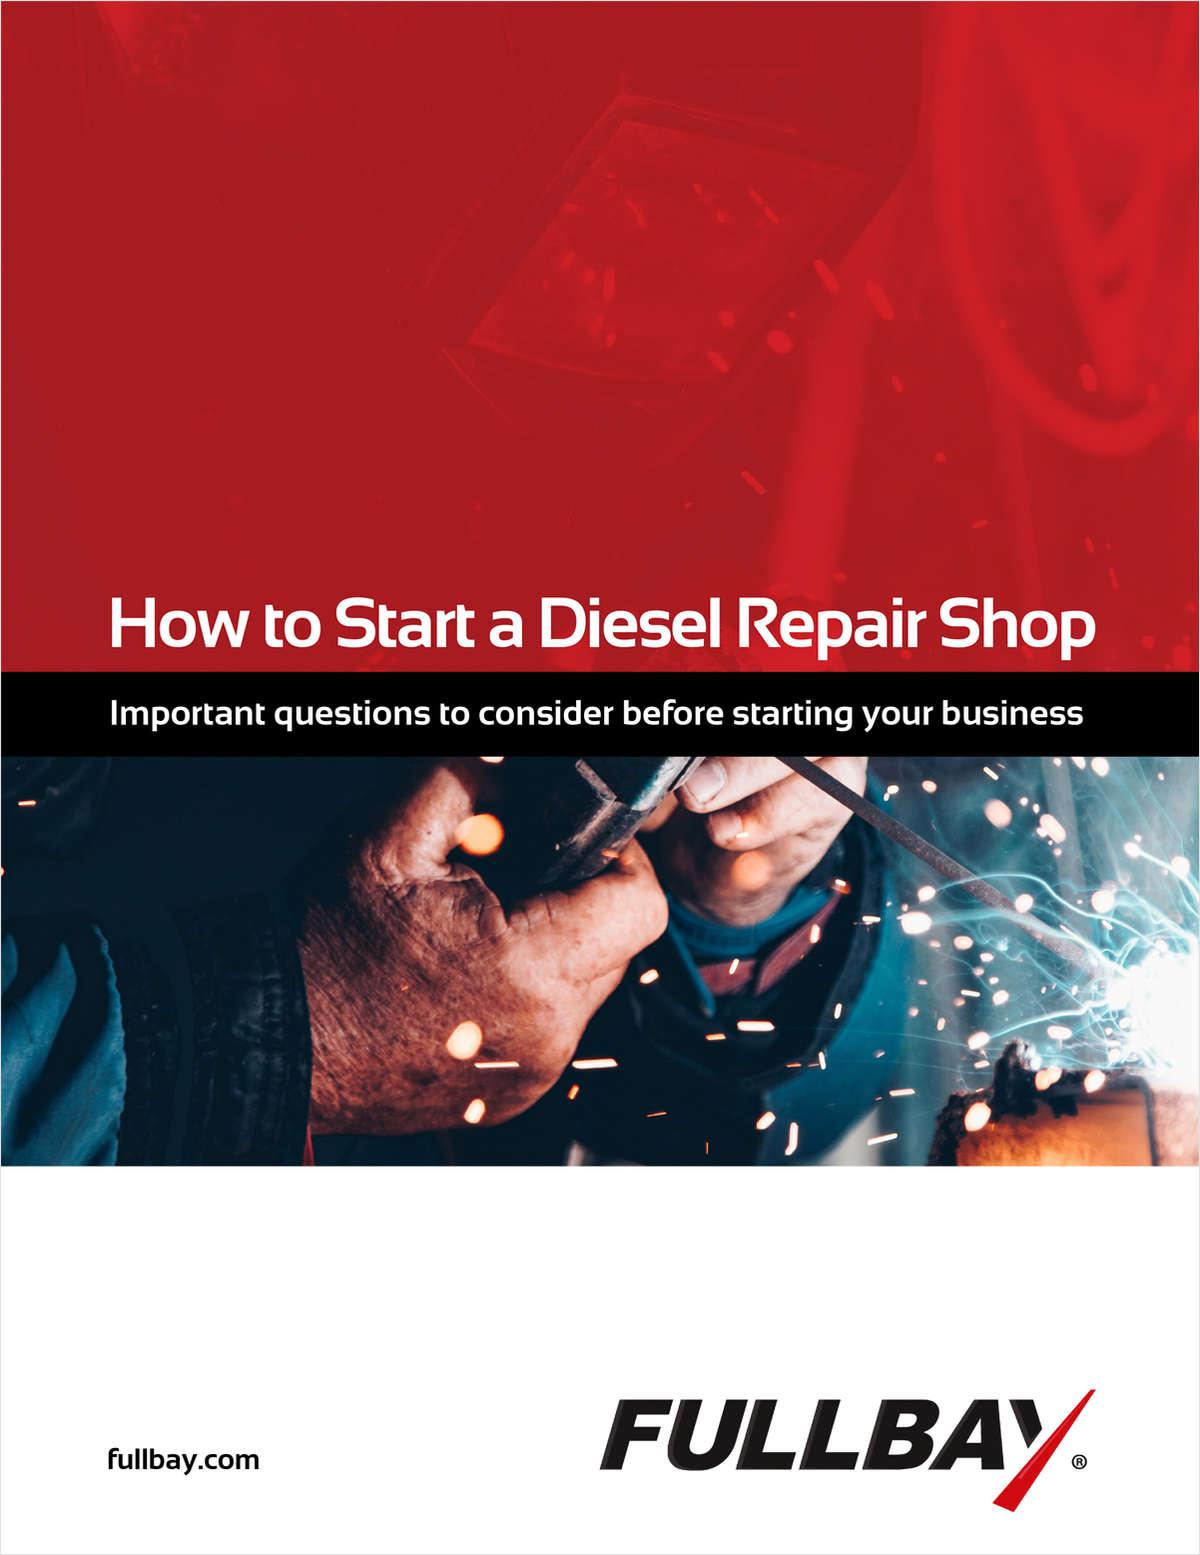 How to Start a Diesel Repair Shop